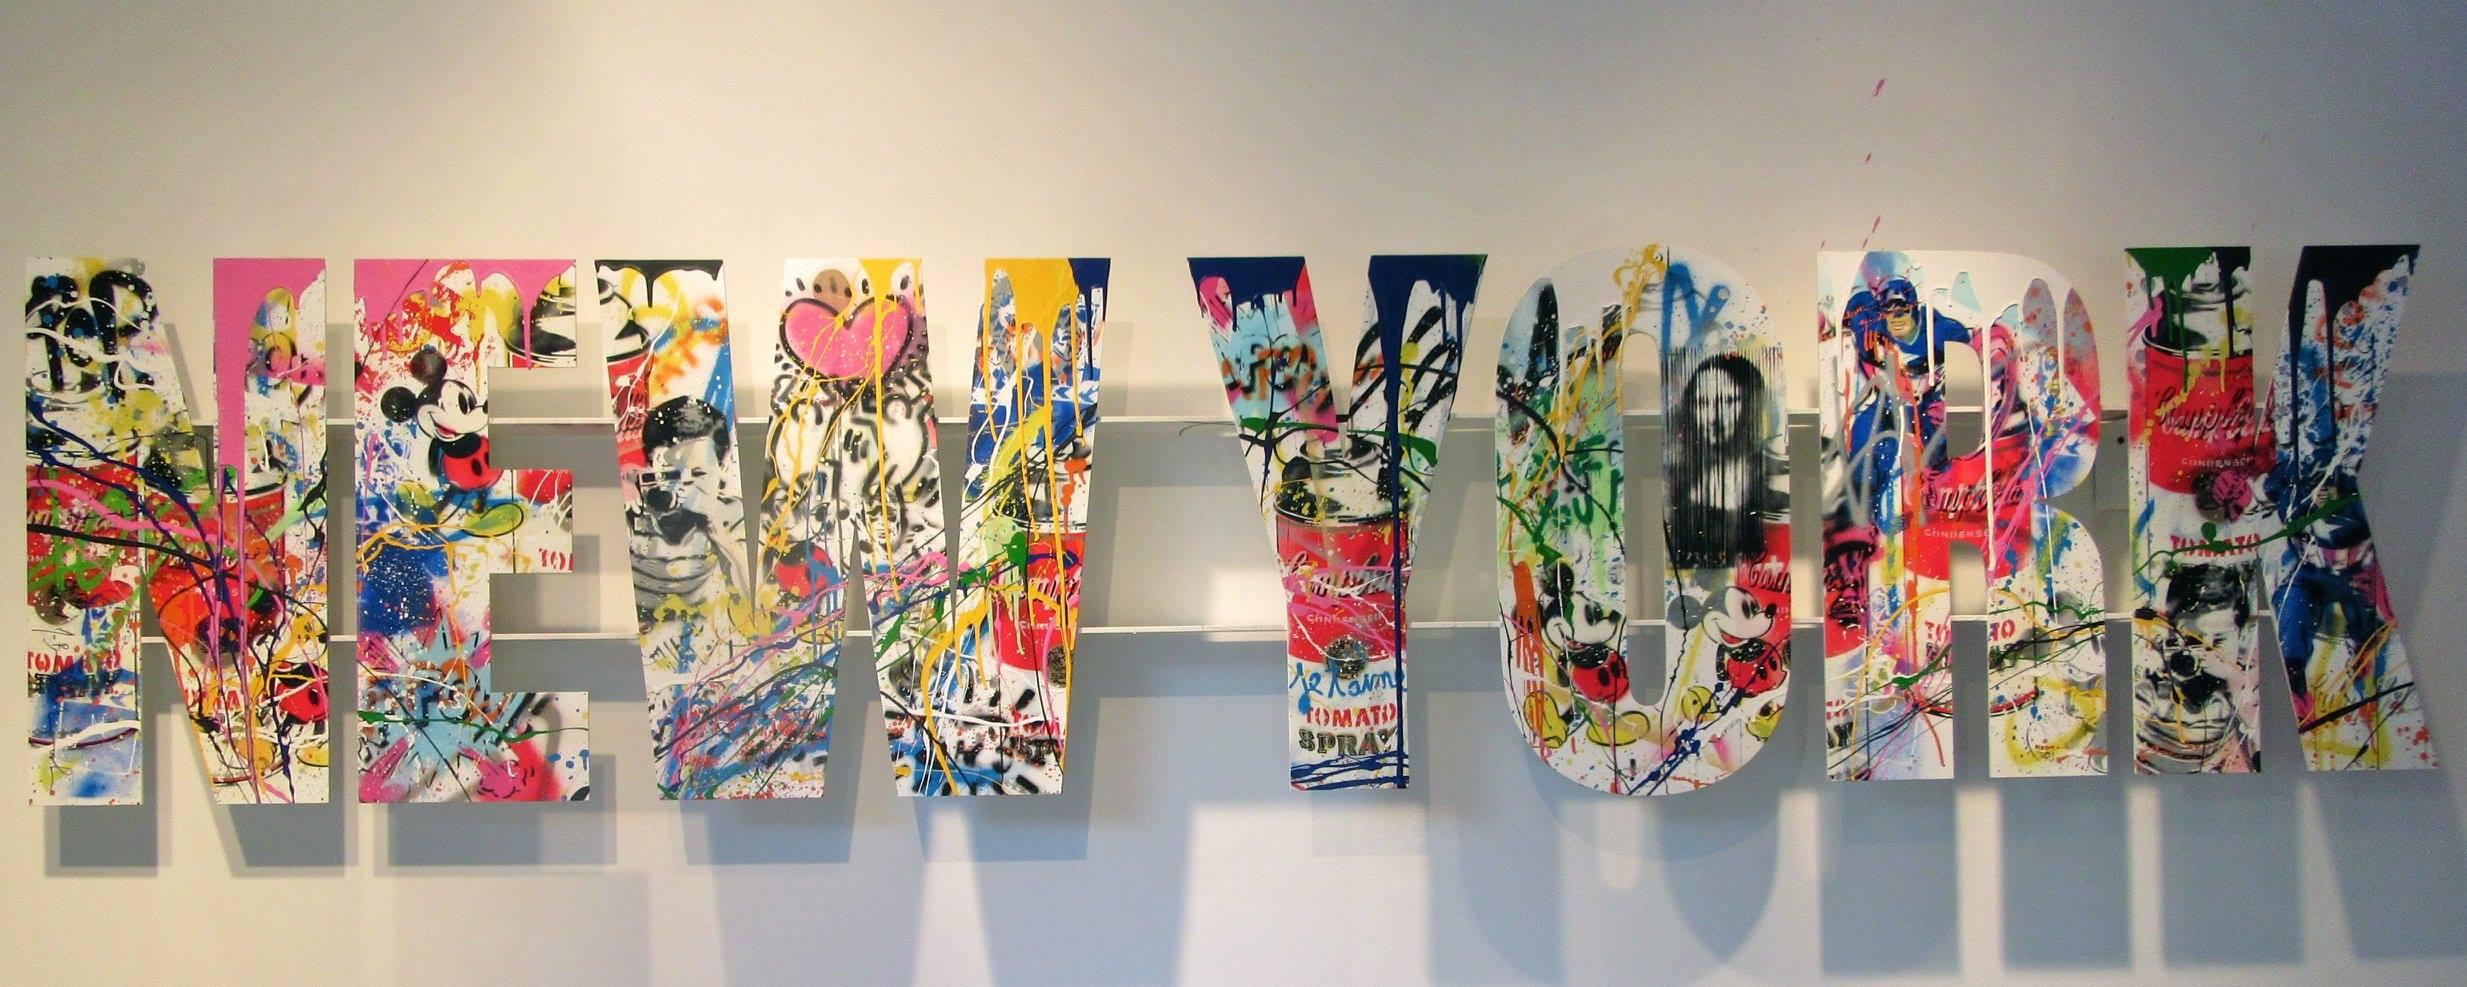 Mr. Brainwash mr-brainwash-pintura-graffiti-cores-comercial-street-art-banksy-10